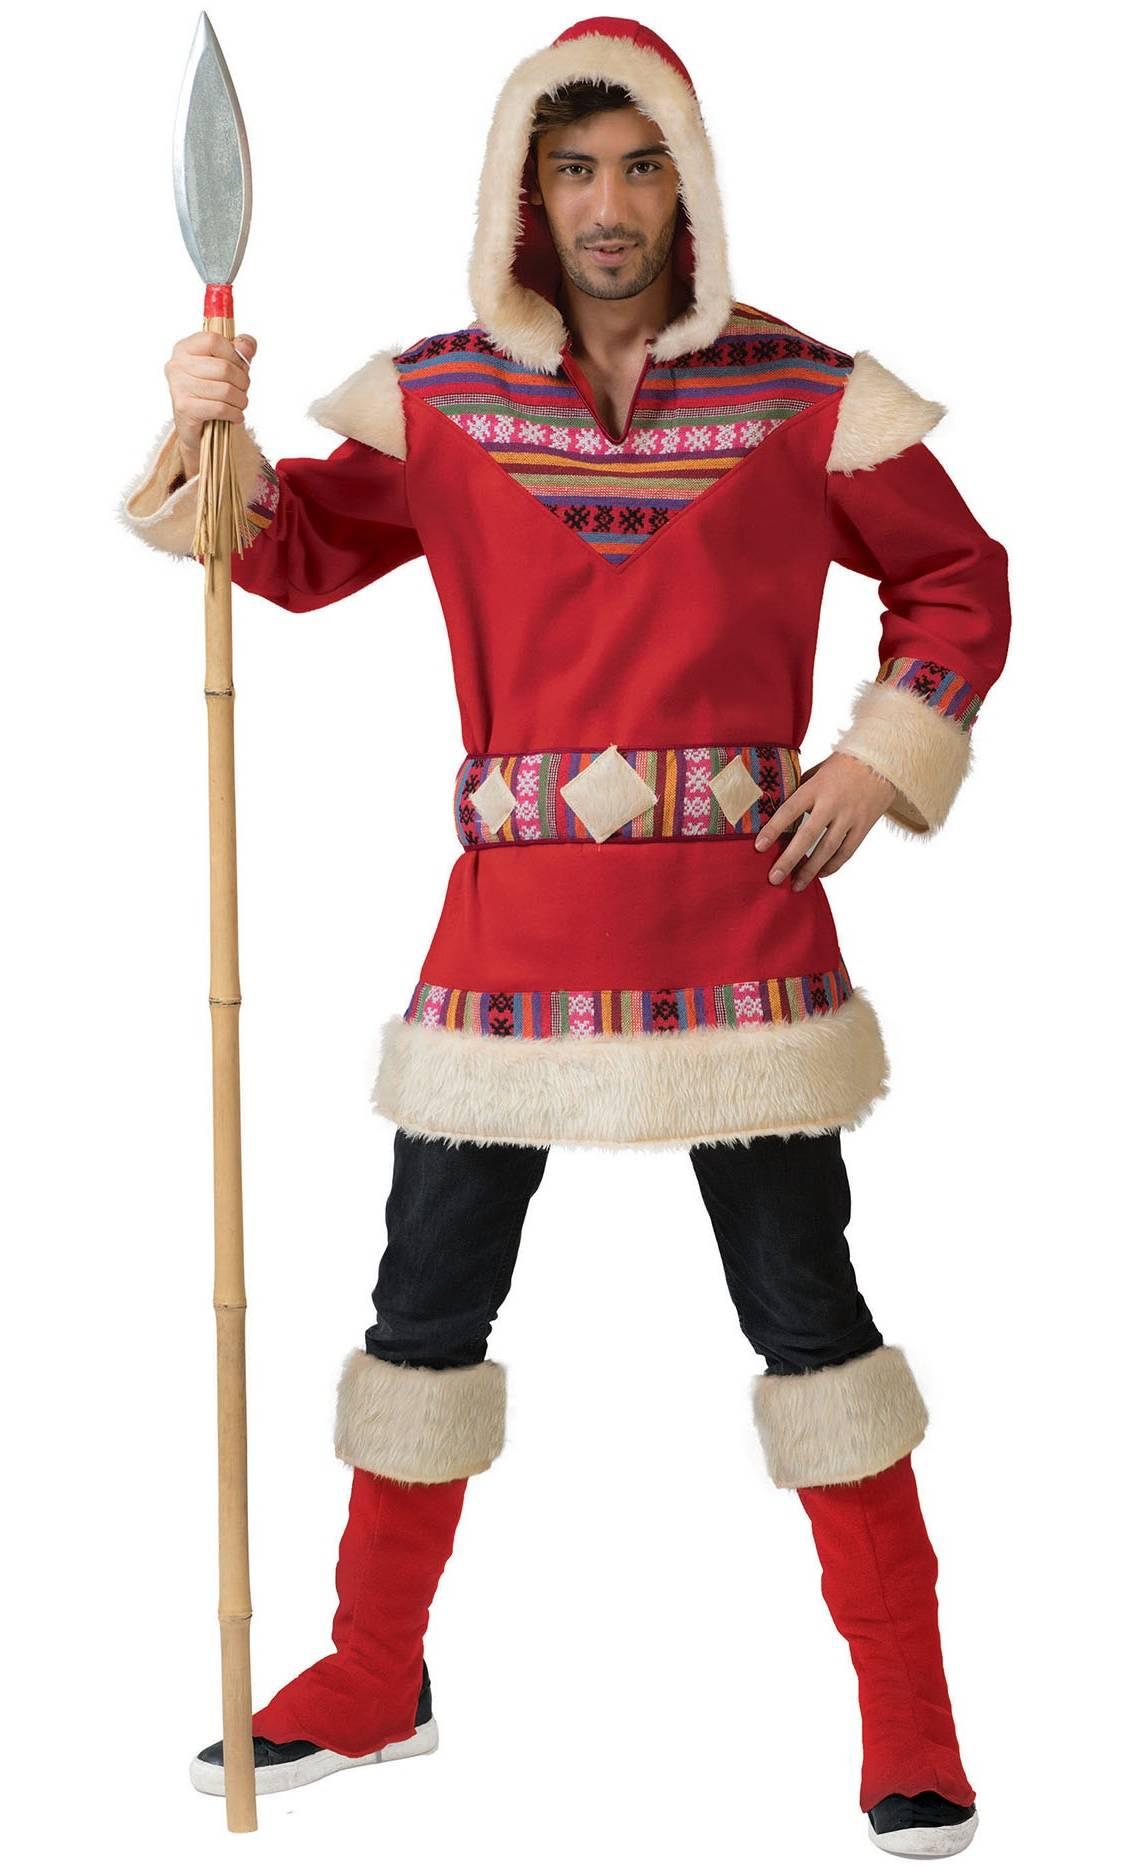 Costume-esquimau-pour-homme-Grande-Taille